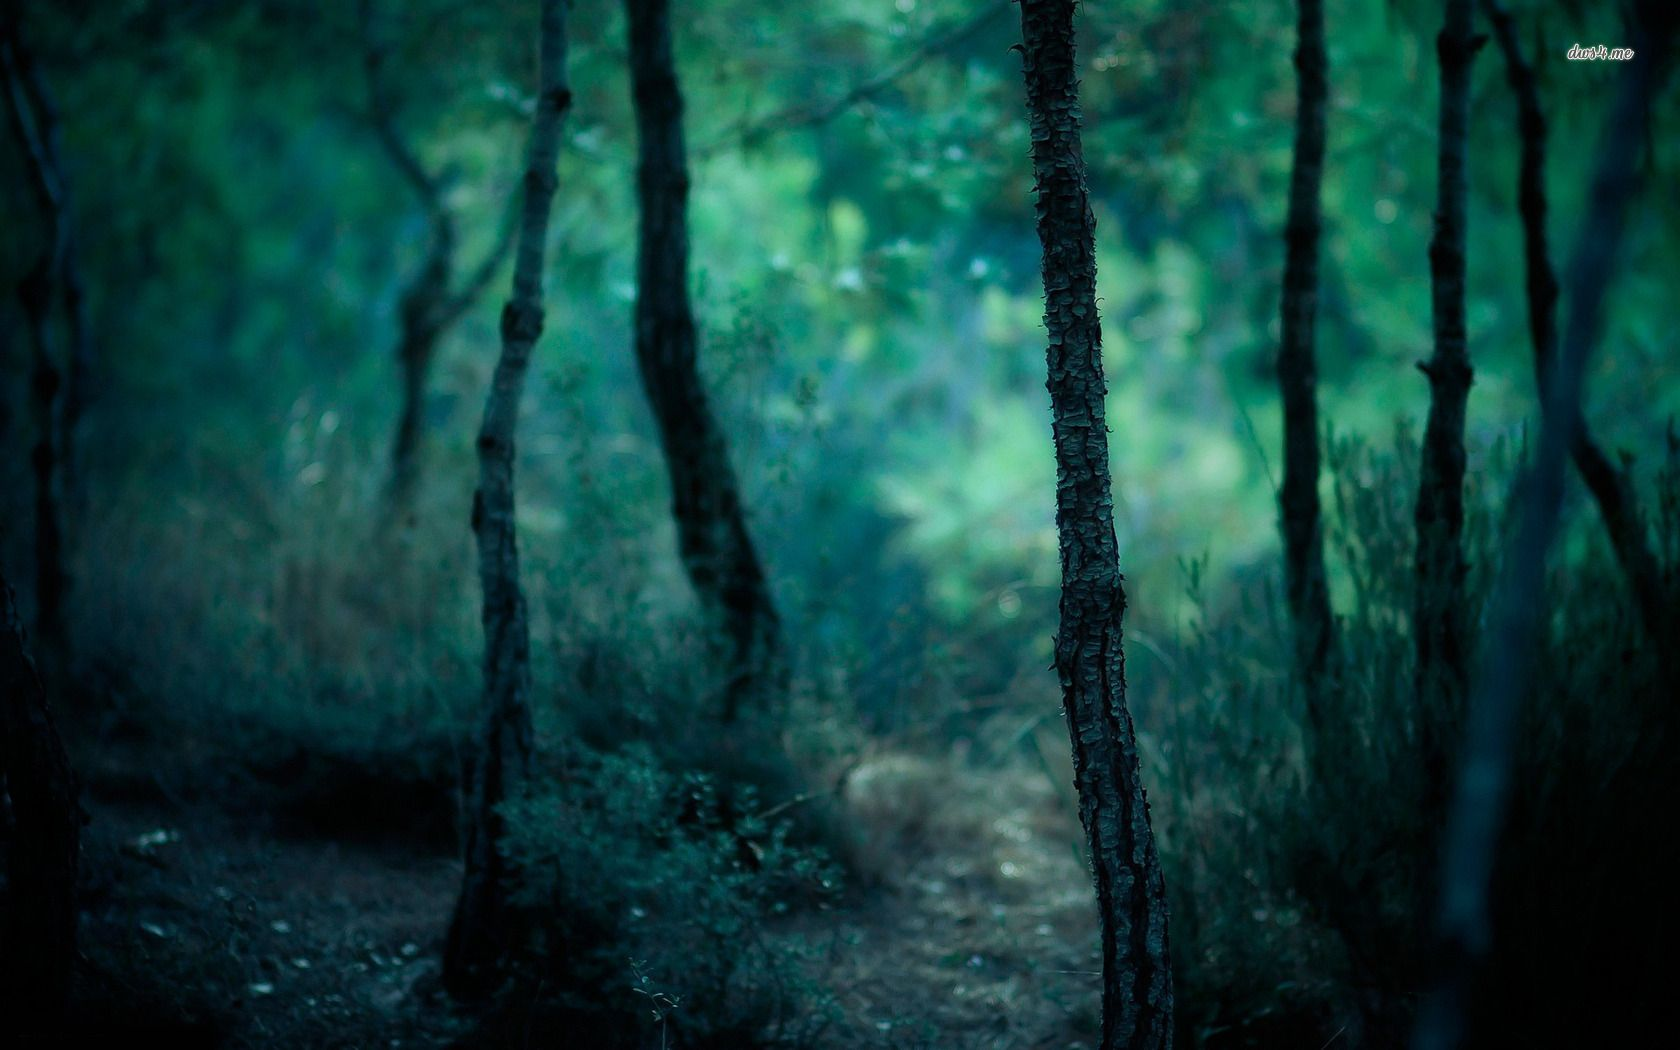 Dark Forest Hd Wallpaper Dark Forest Wallpaper Forest Wallpapers Forest Pictures